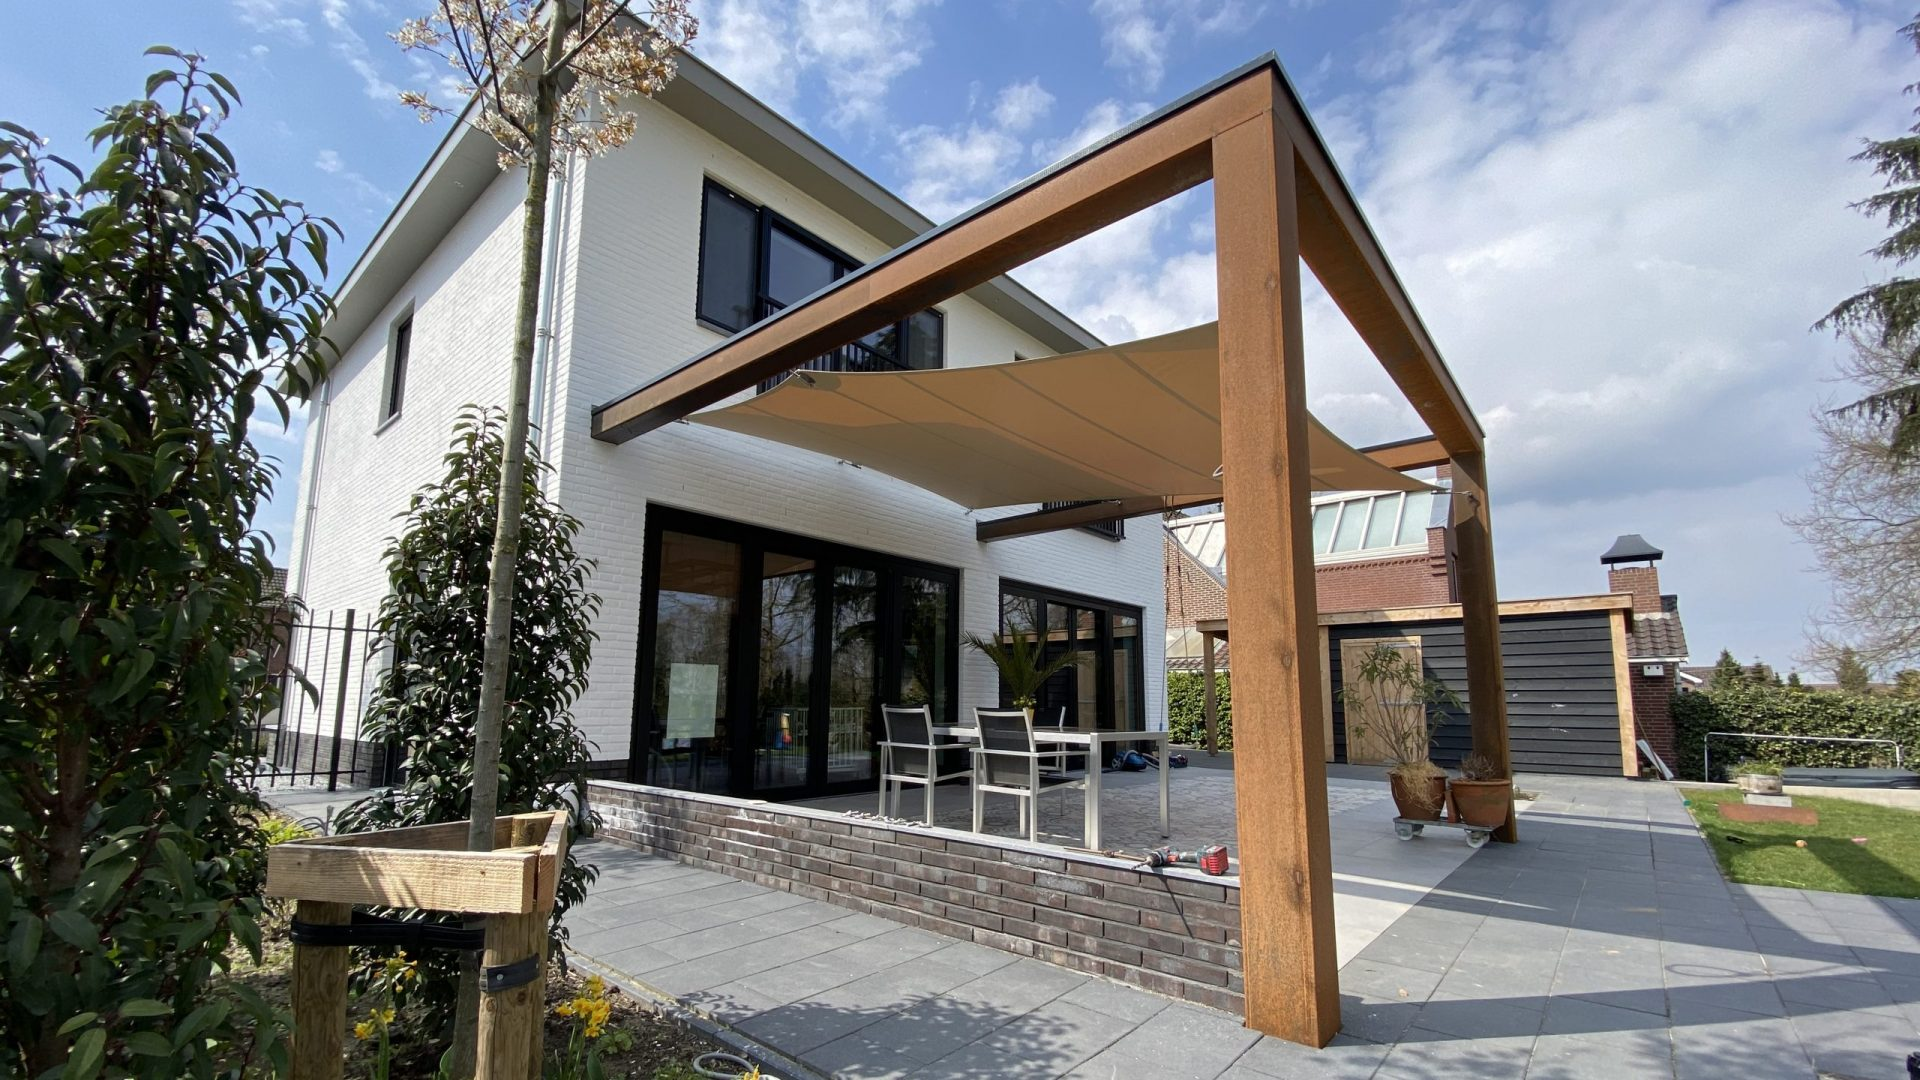 EPIC Living Garden Shelters - Bloedel shelter 1